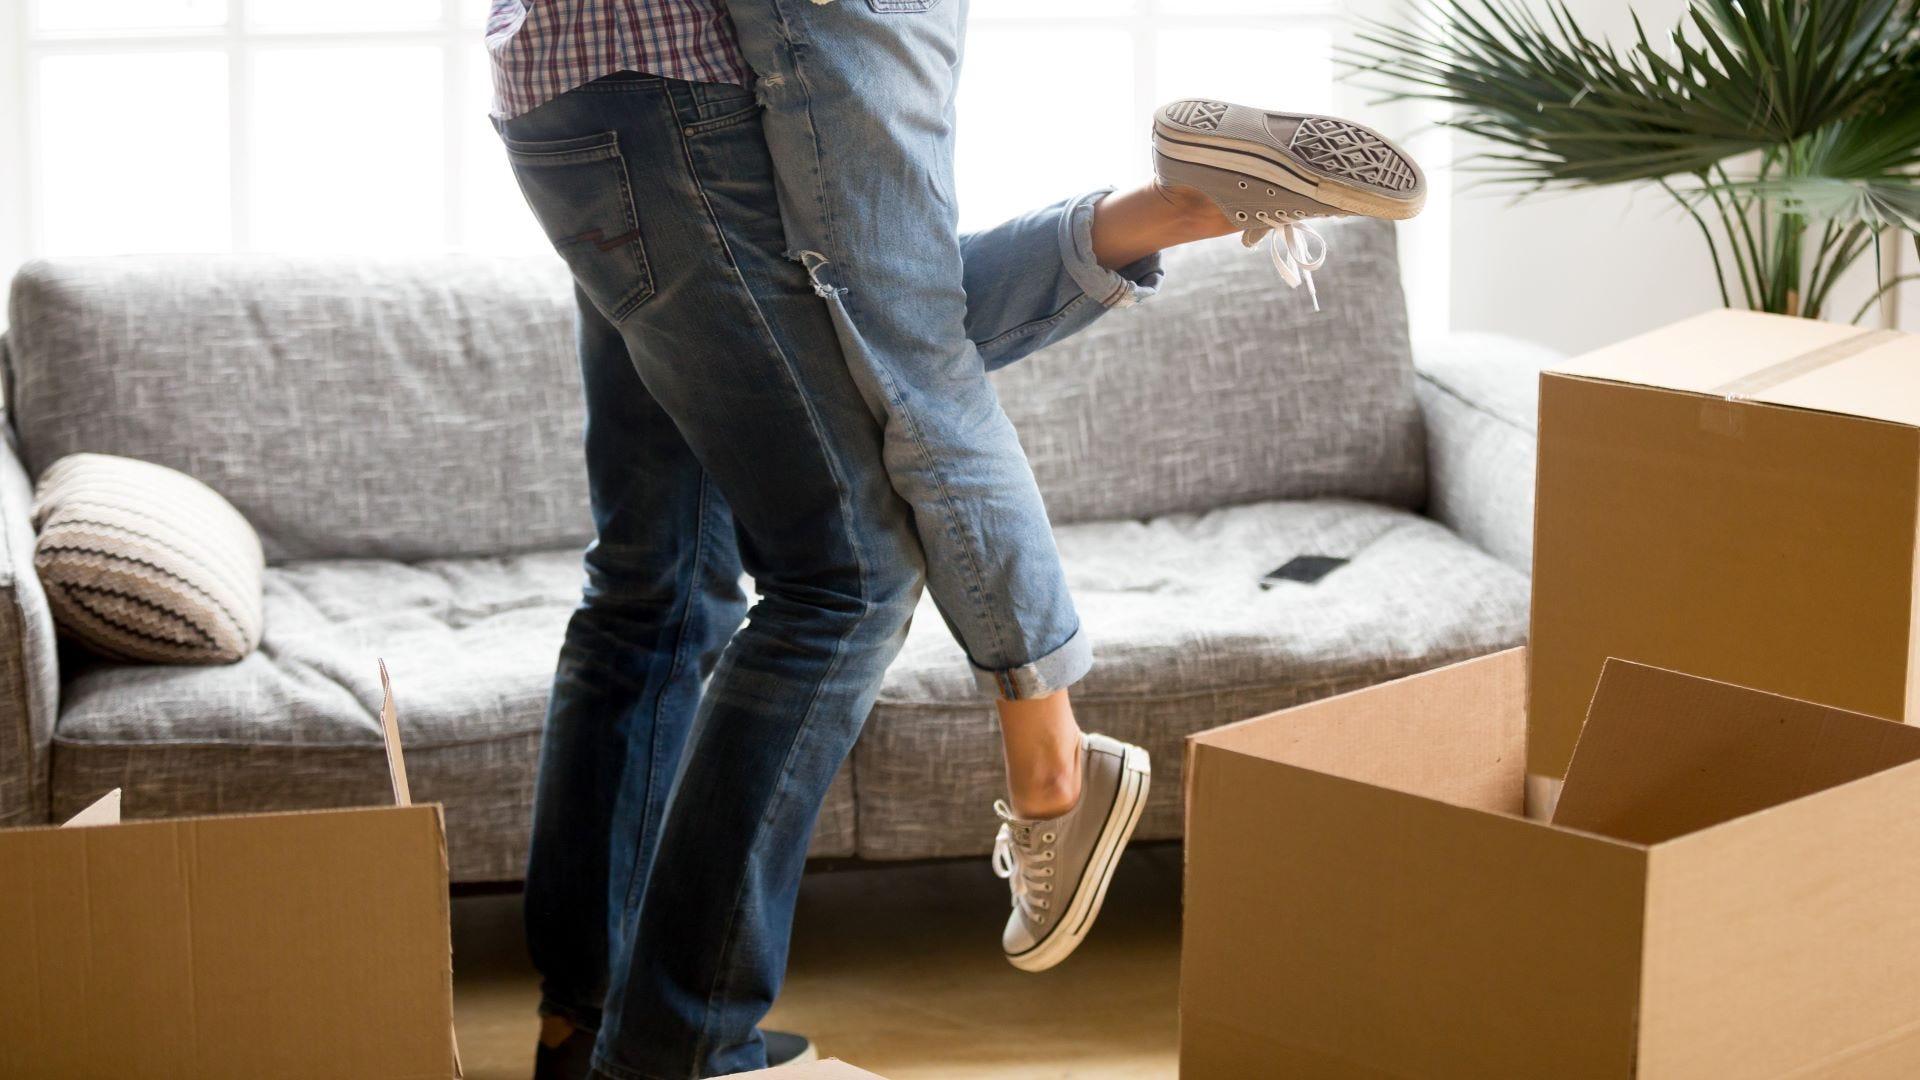 Man lifting woman among cardboard boxes on moving day.